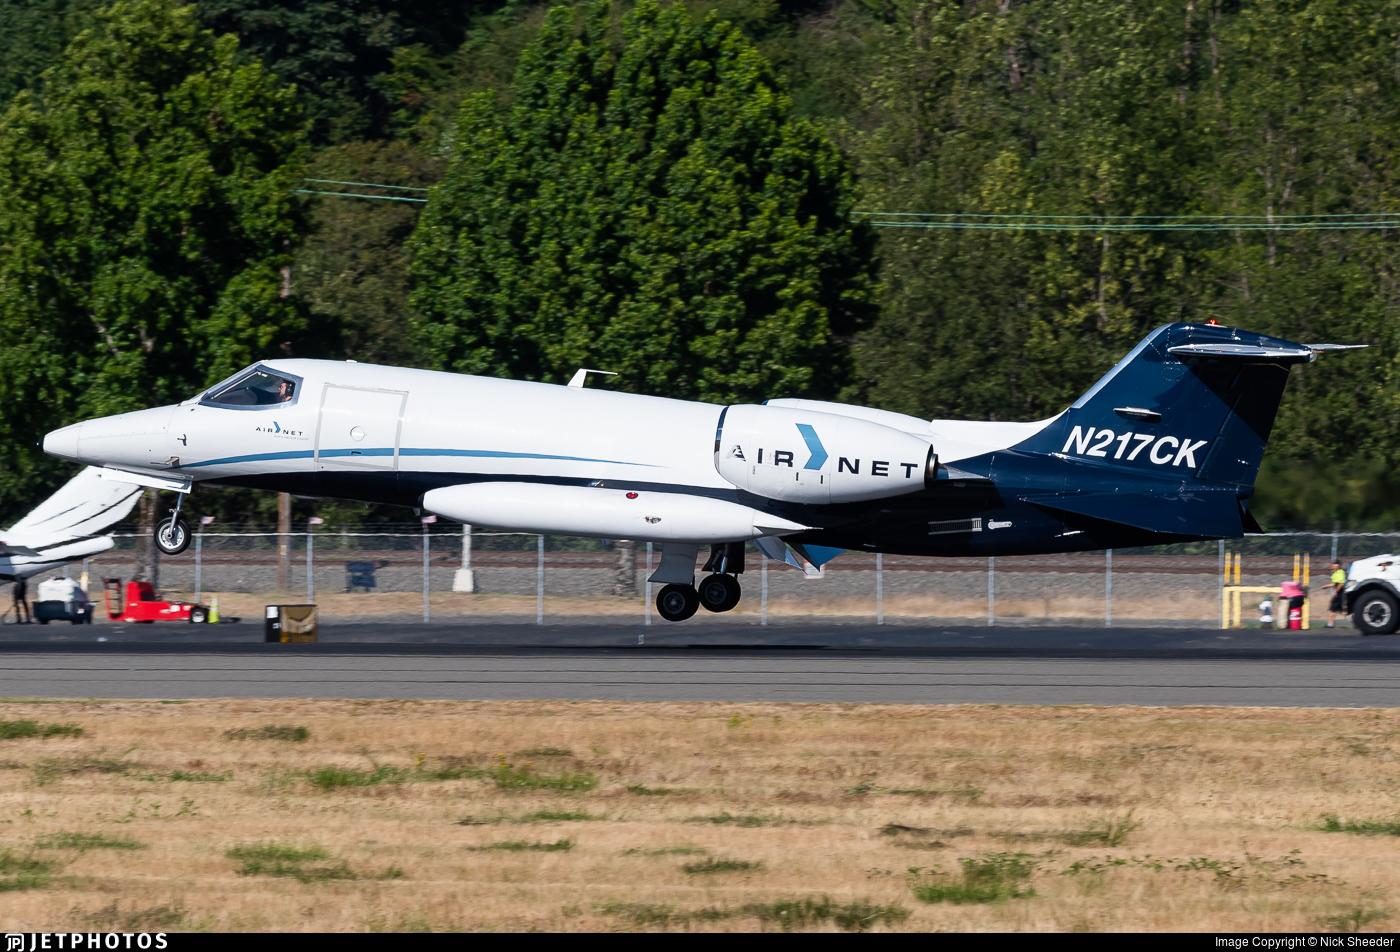 N217CK - Bombardier Learjet 35A - AirNet Systems